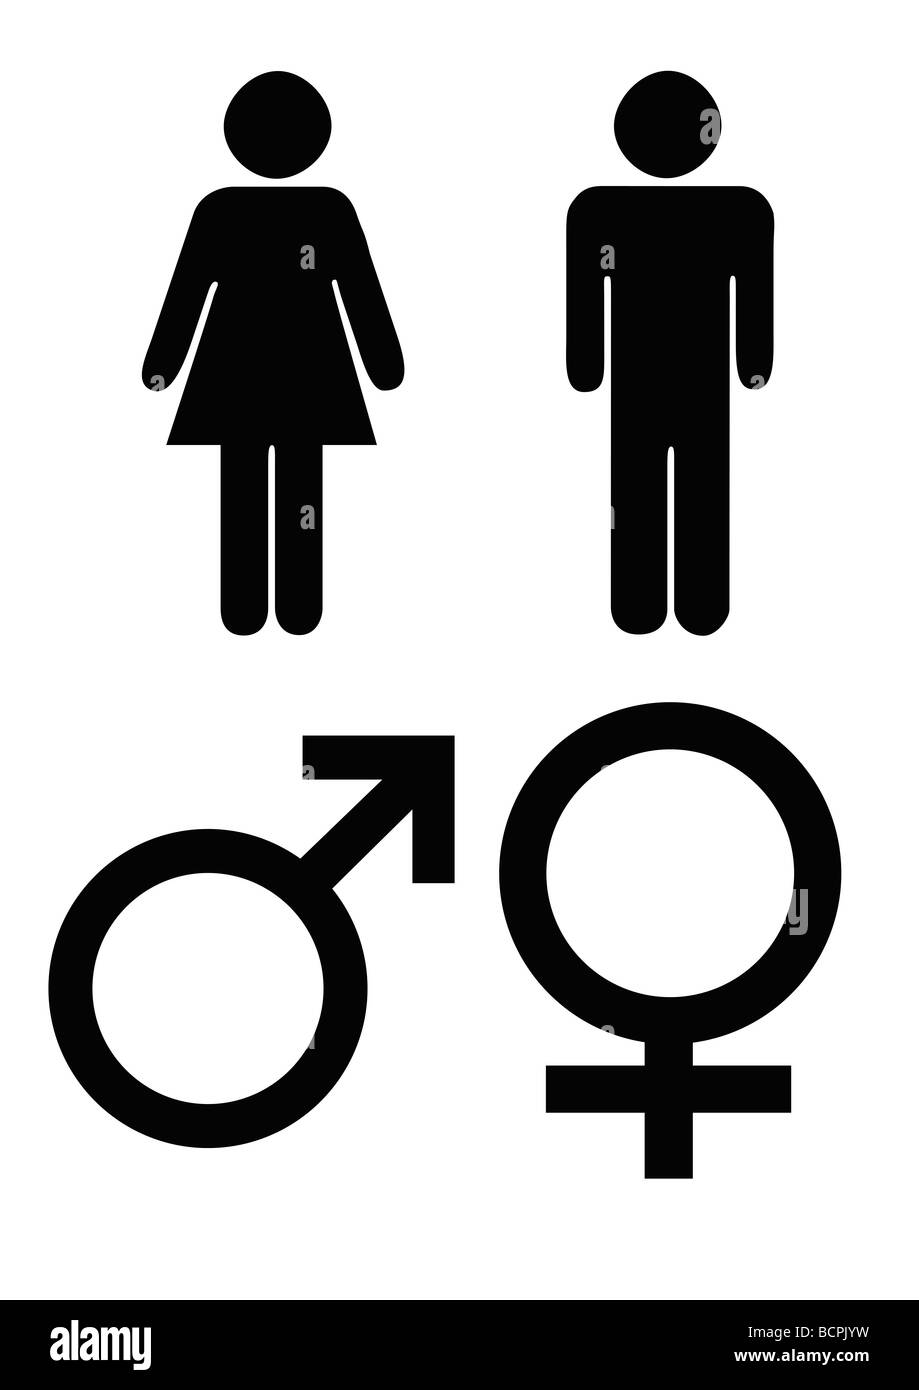 Male and female gender symbols in black silhouette isolated on male and female gender symbols in black silhouette isolated on white background buycottarizona